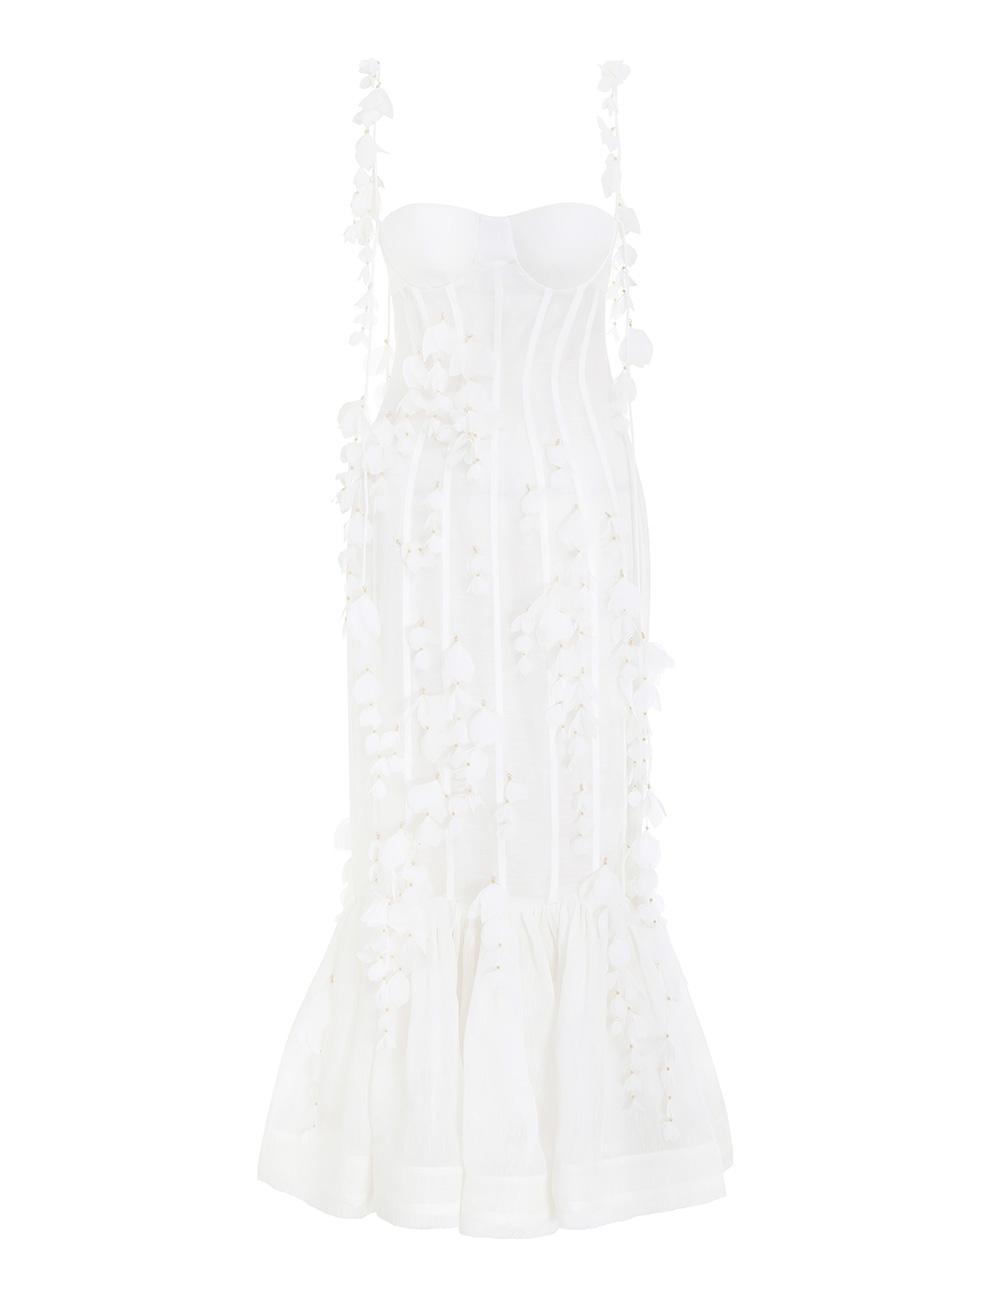 Botanica Petal Gown